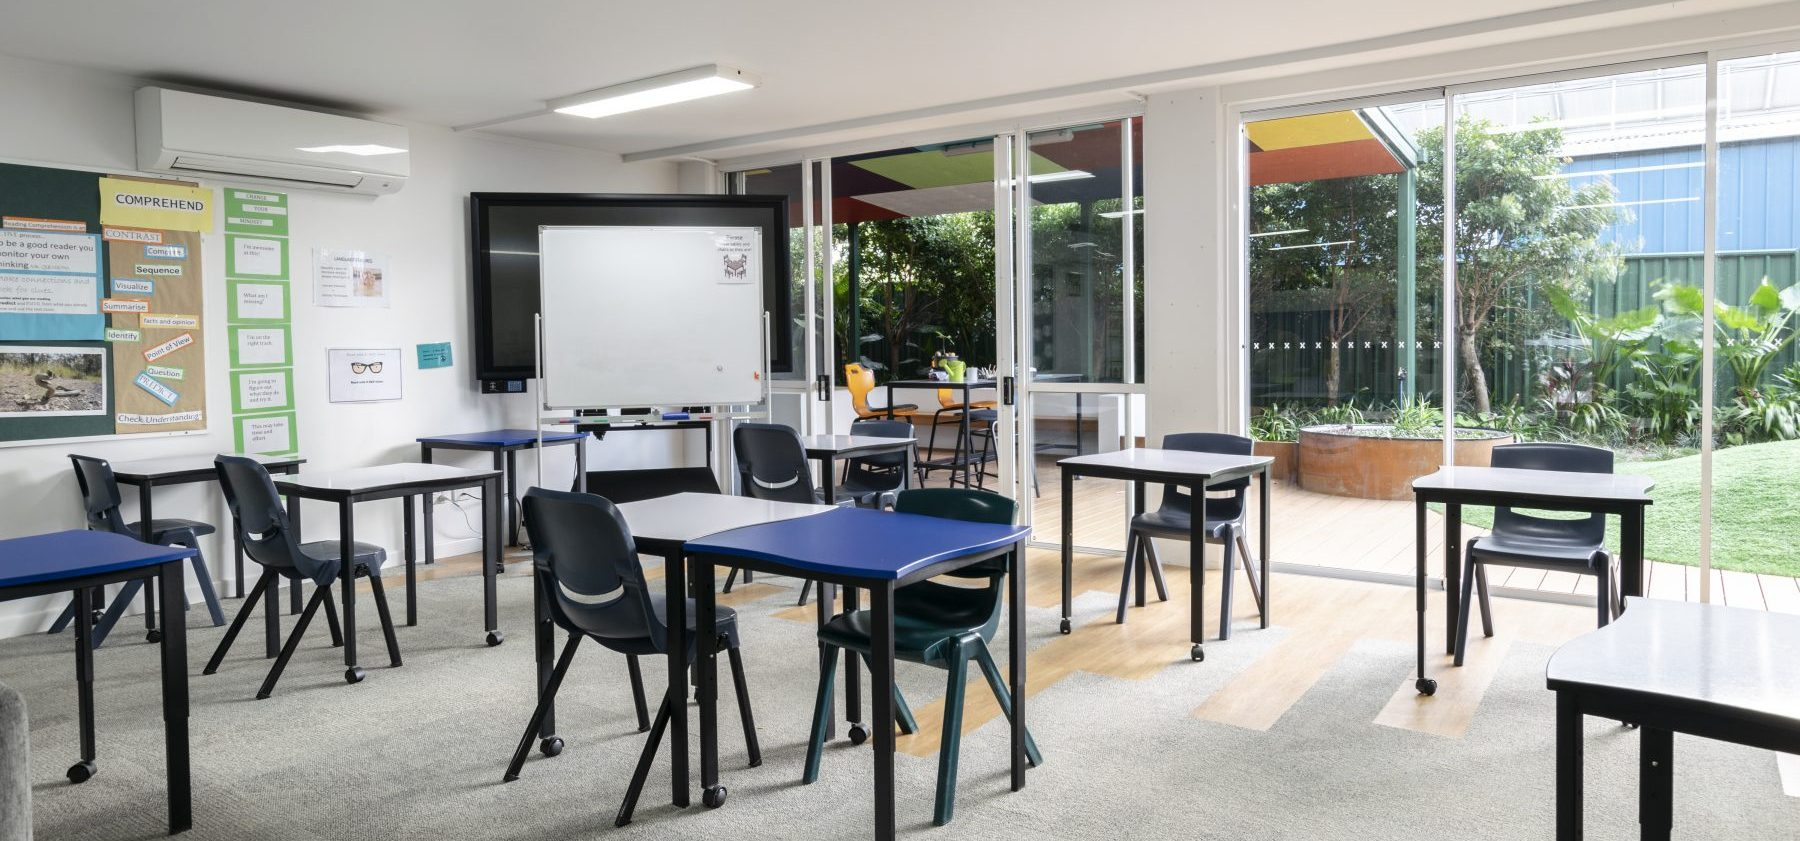 St Patricks College Interior Classroom